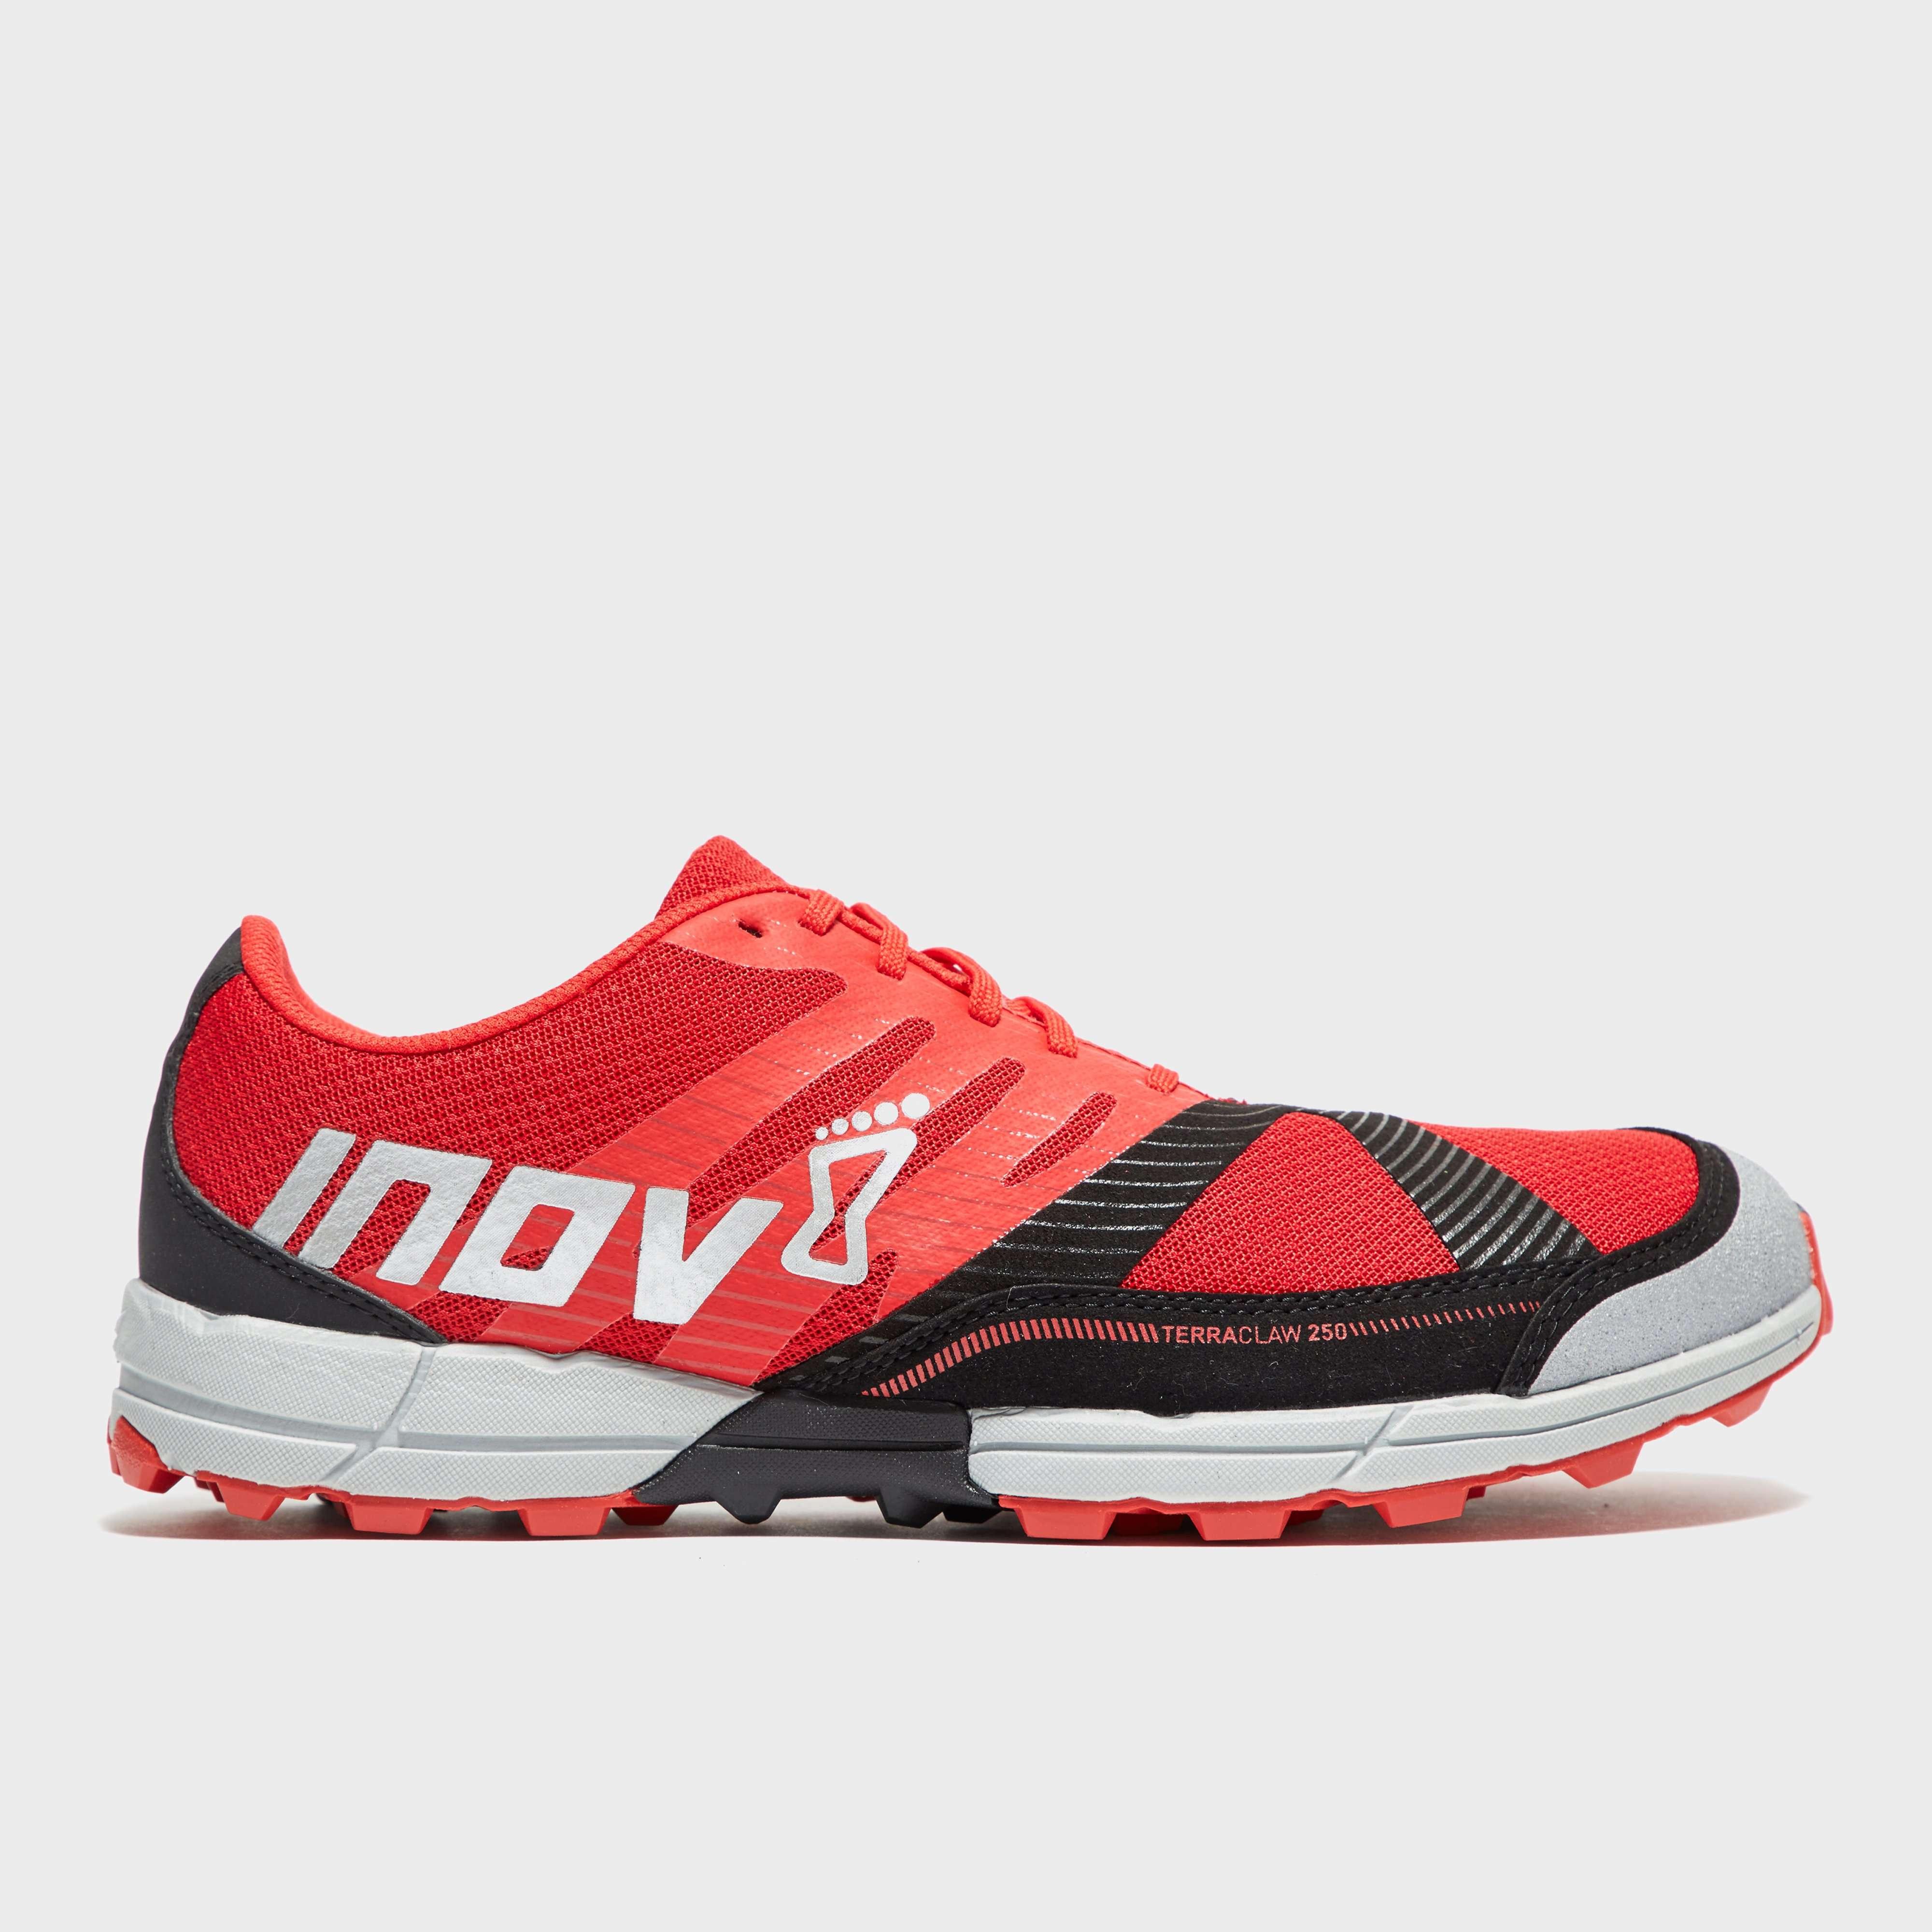 INOV-8 Men's Terraclaw 250 Trail Running Shoes